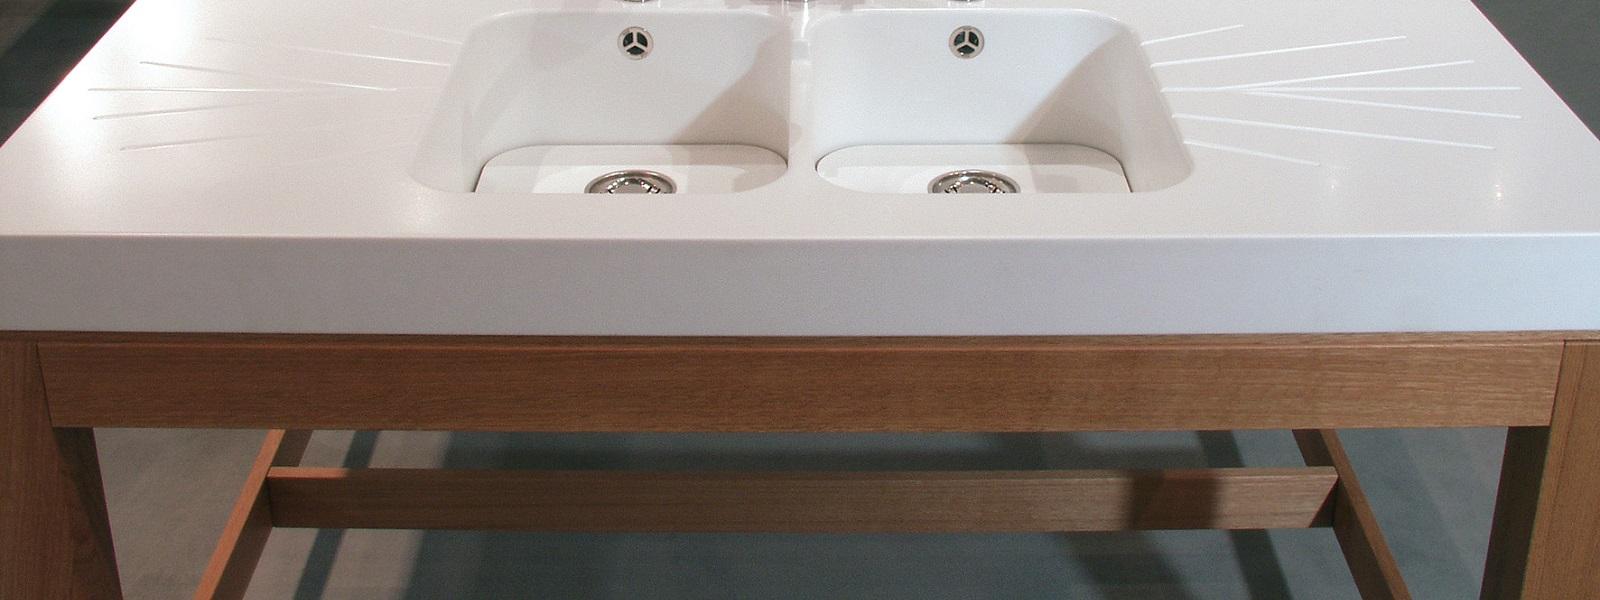 Corian tafel op maat – duurzaam en hygiënisch  Correnti # Wasbak Tafel_142156